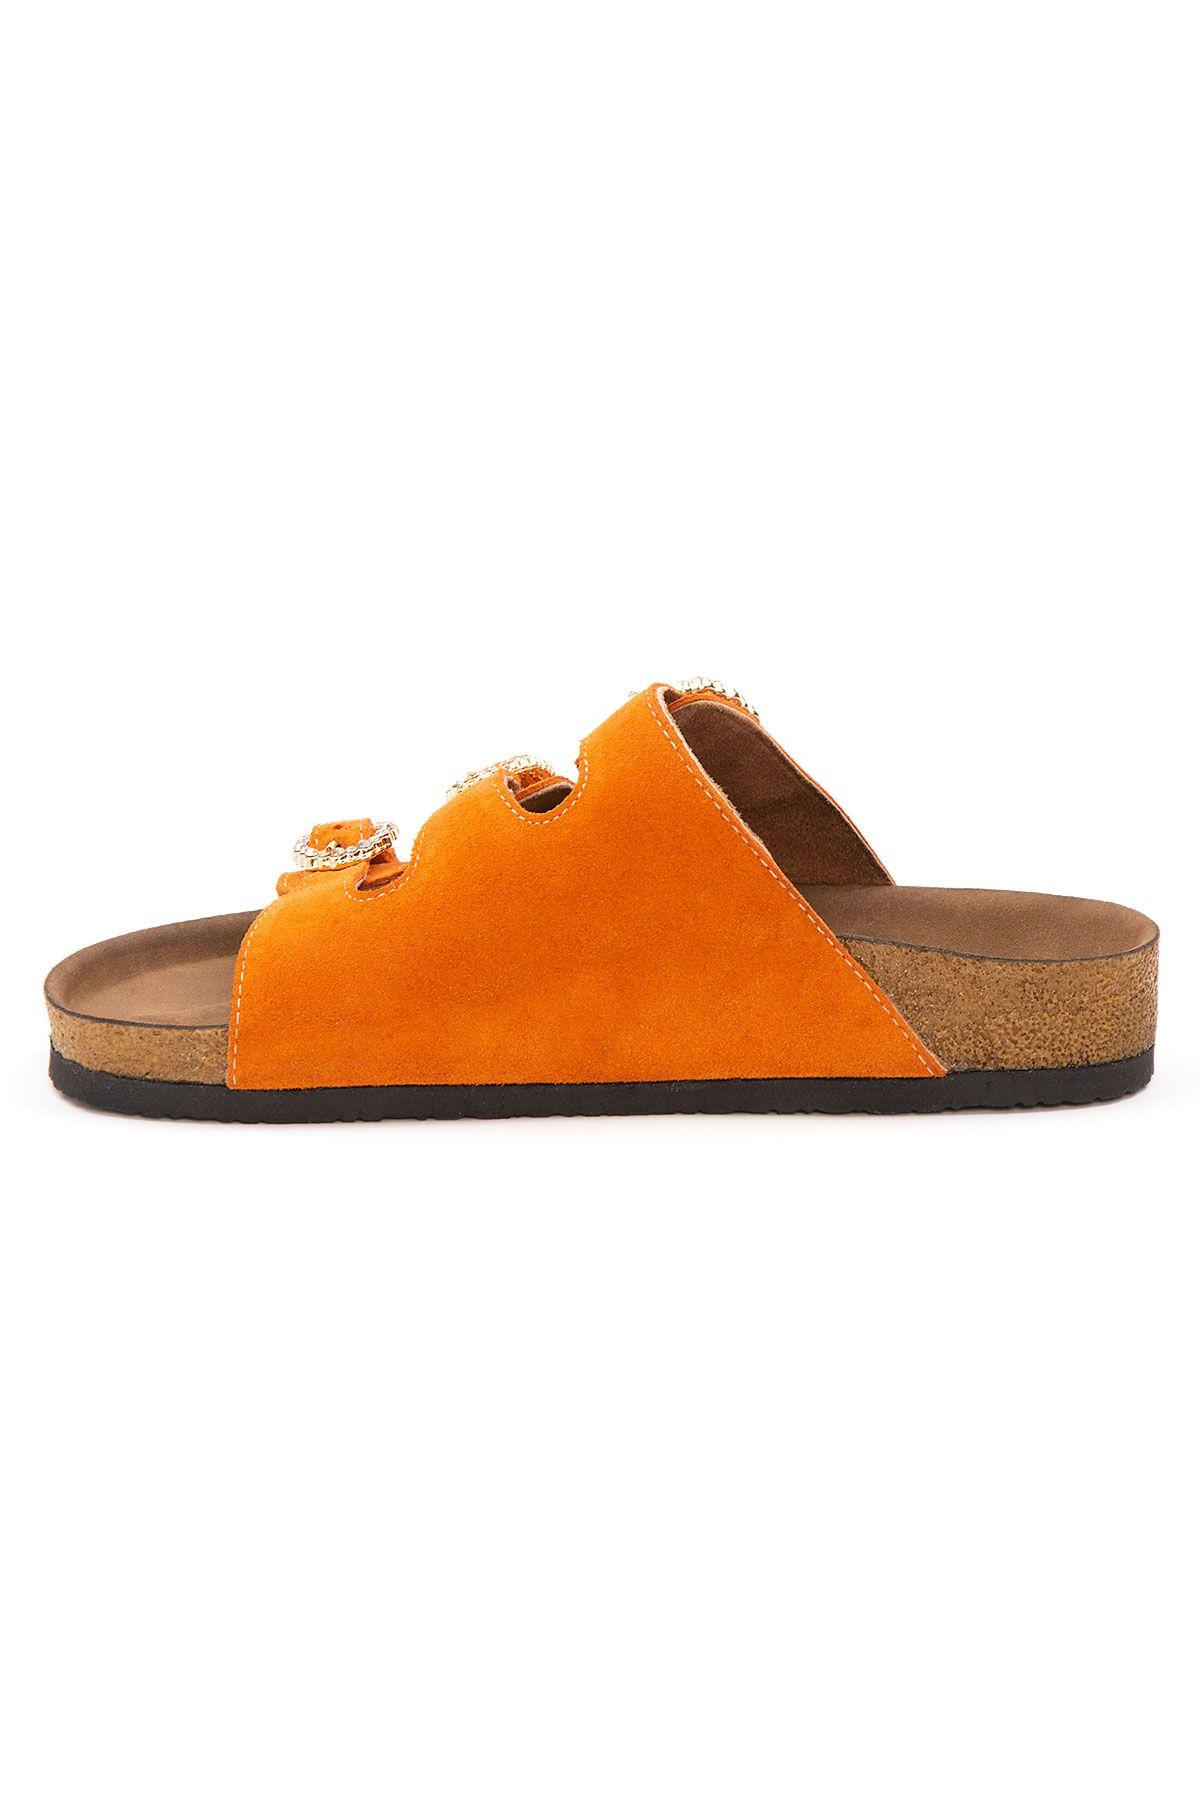 Pegia Women's Stone Buckled Suede Slippers 215528 Orange